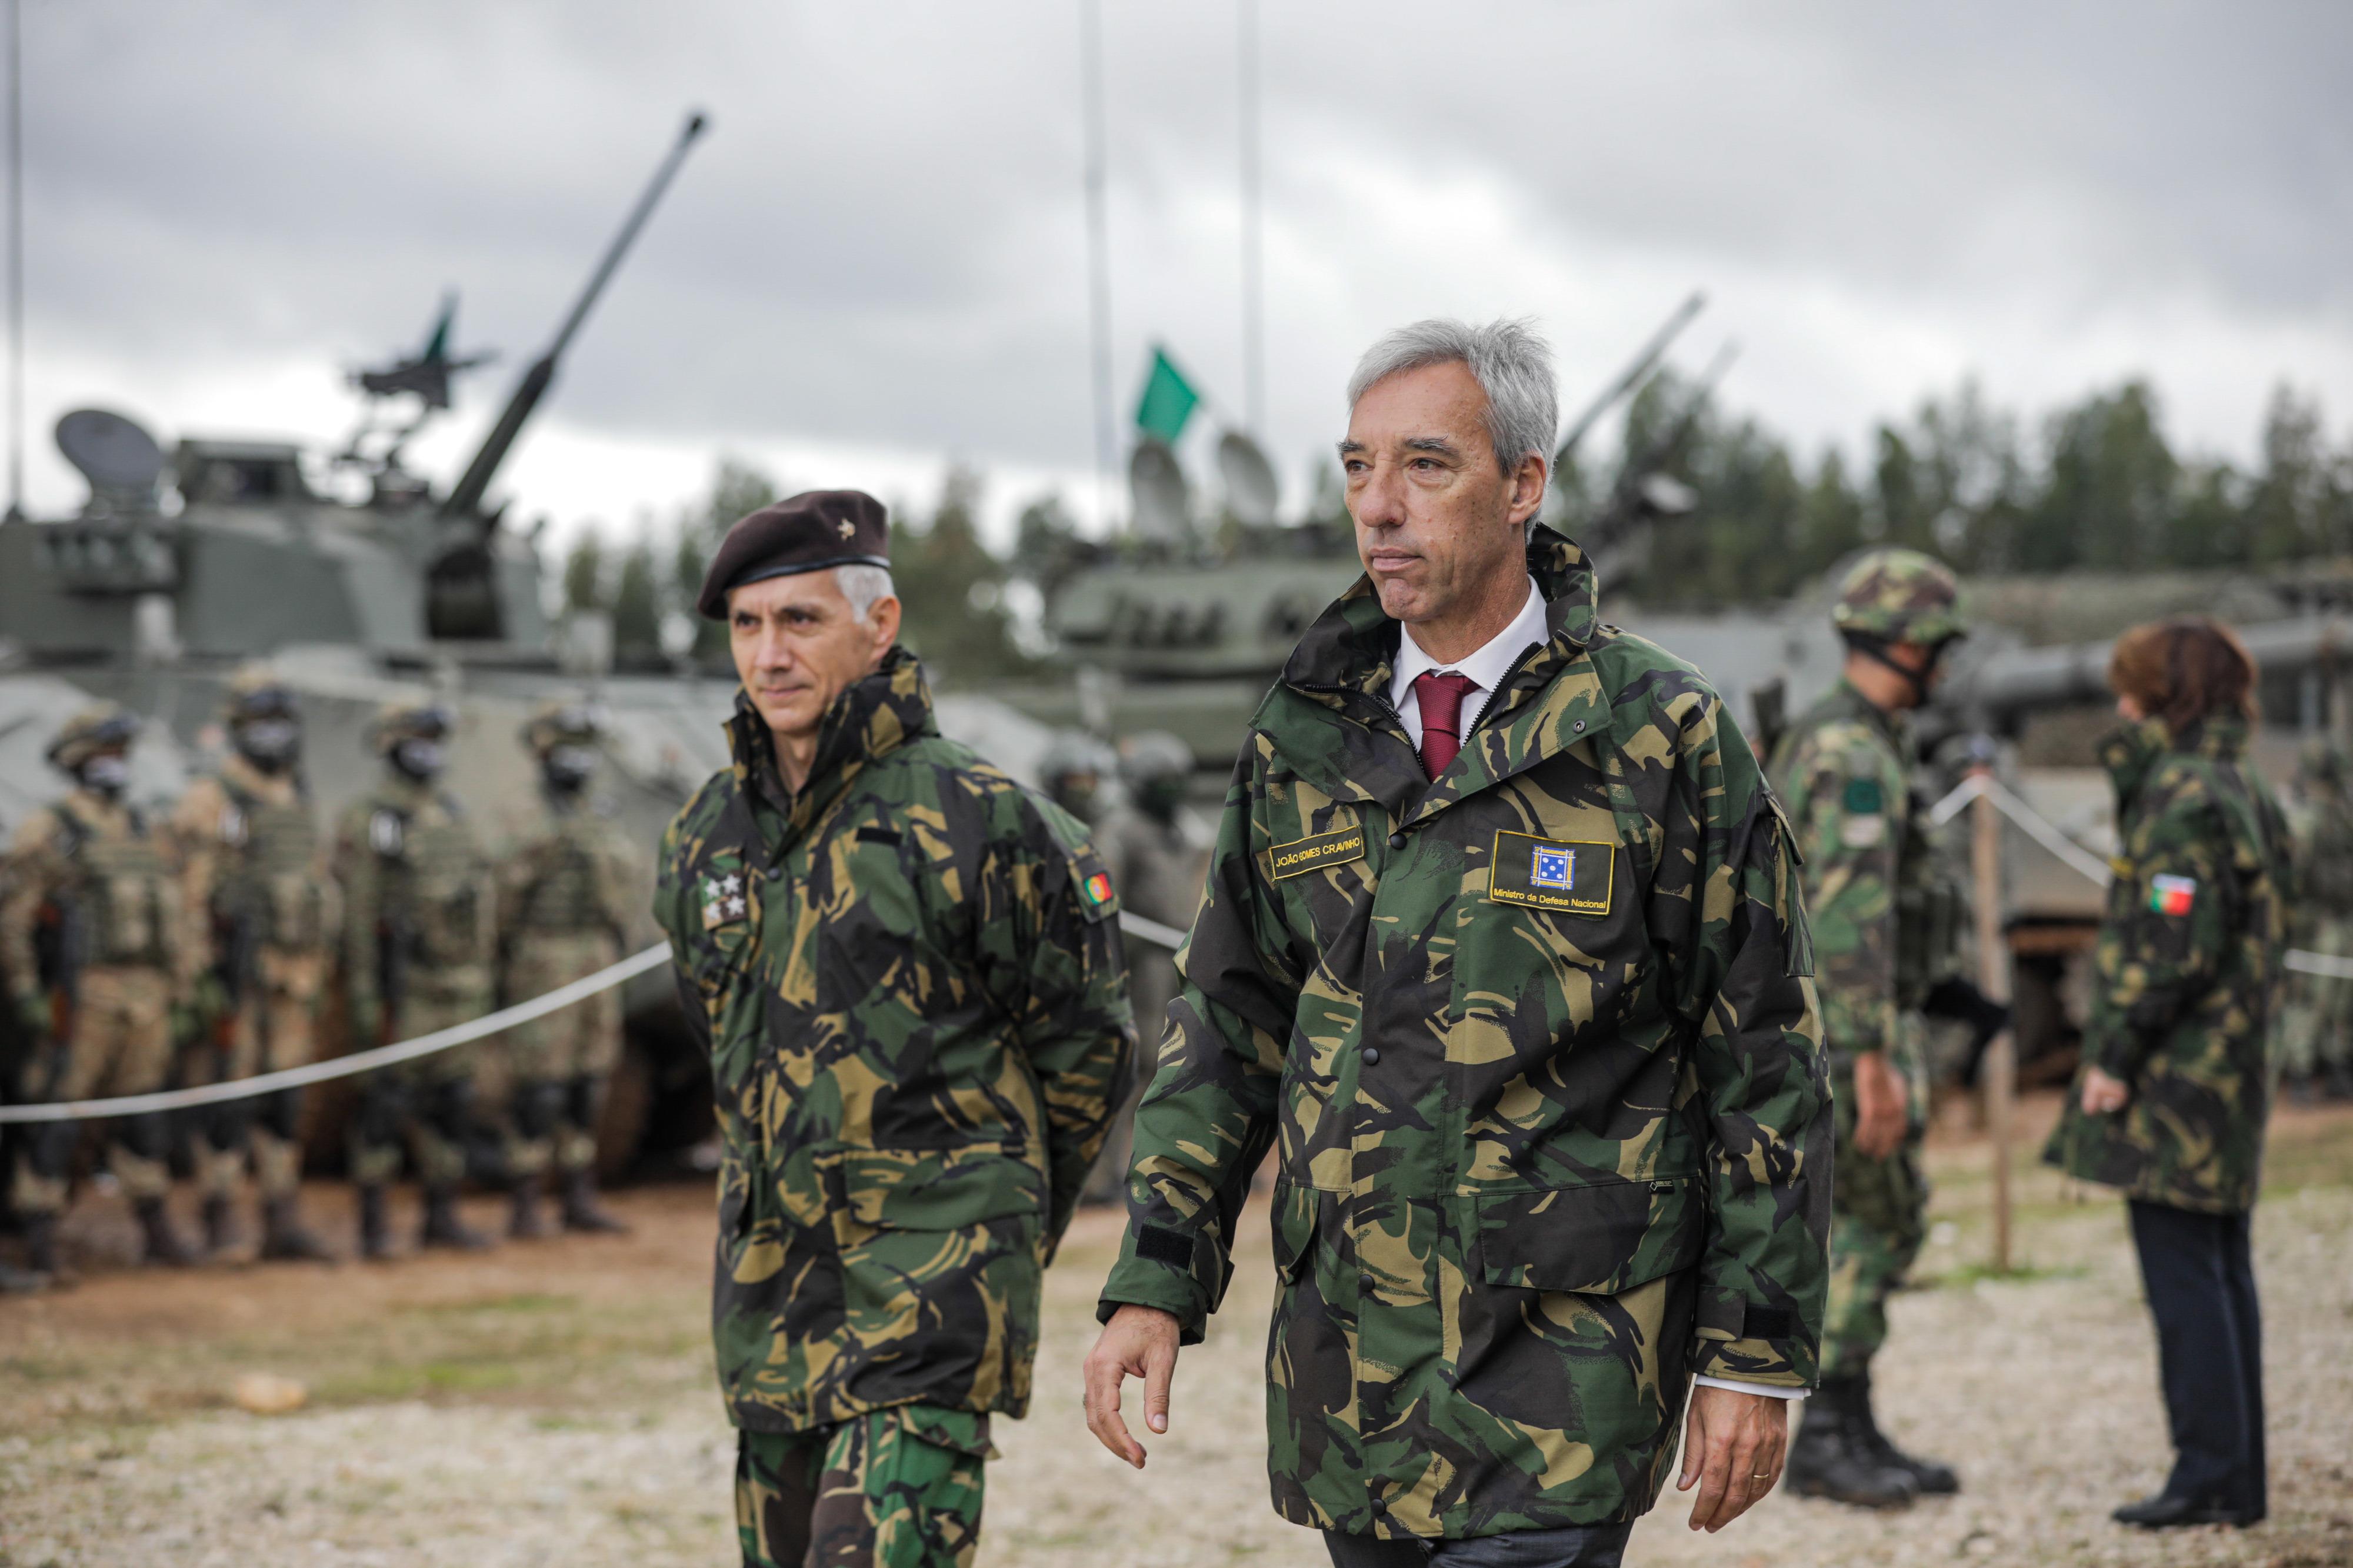 Ministro da Defesa vai ao Mali para visitar as tropas portuguesas